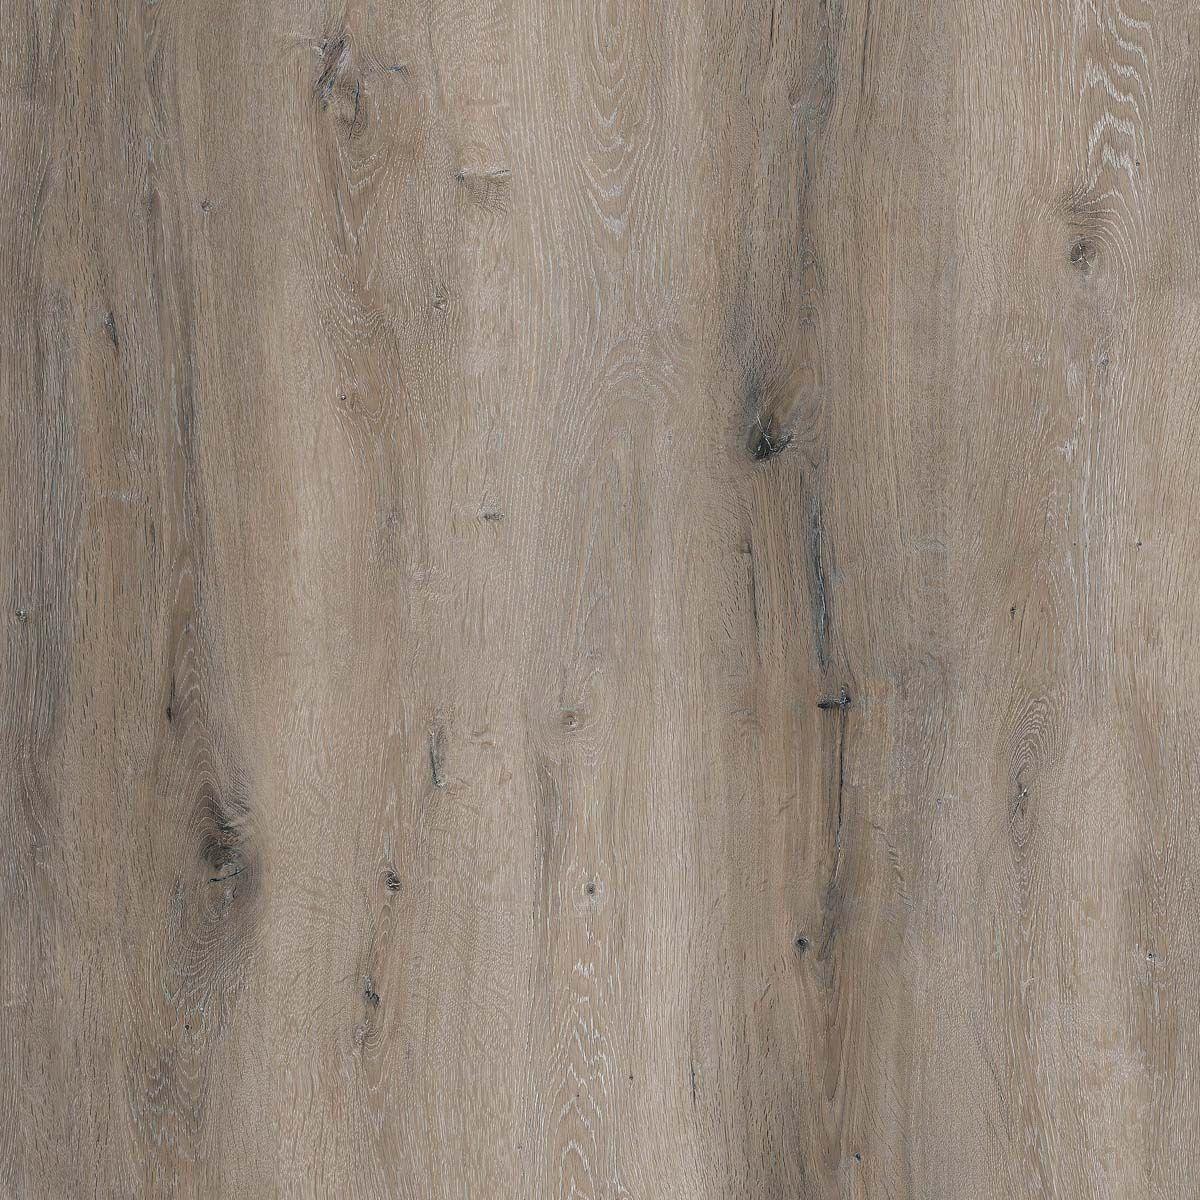 Lame PVC clipsable XXL bois marron blanchi 5mm Teramo